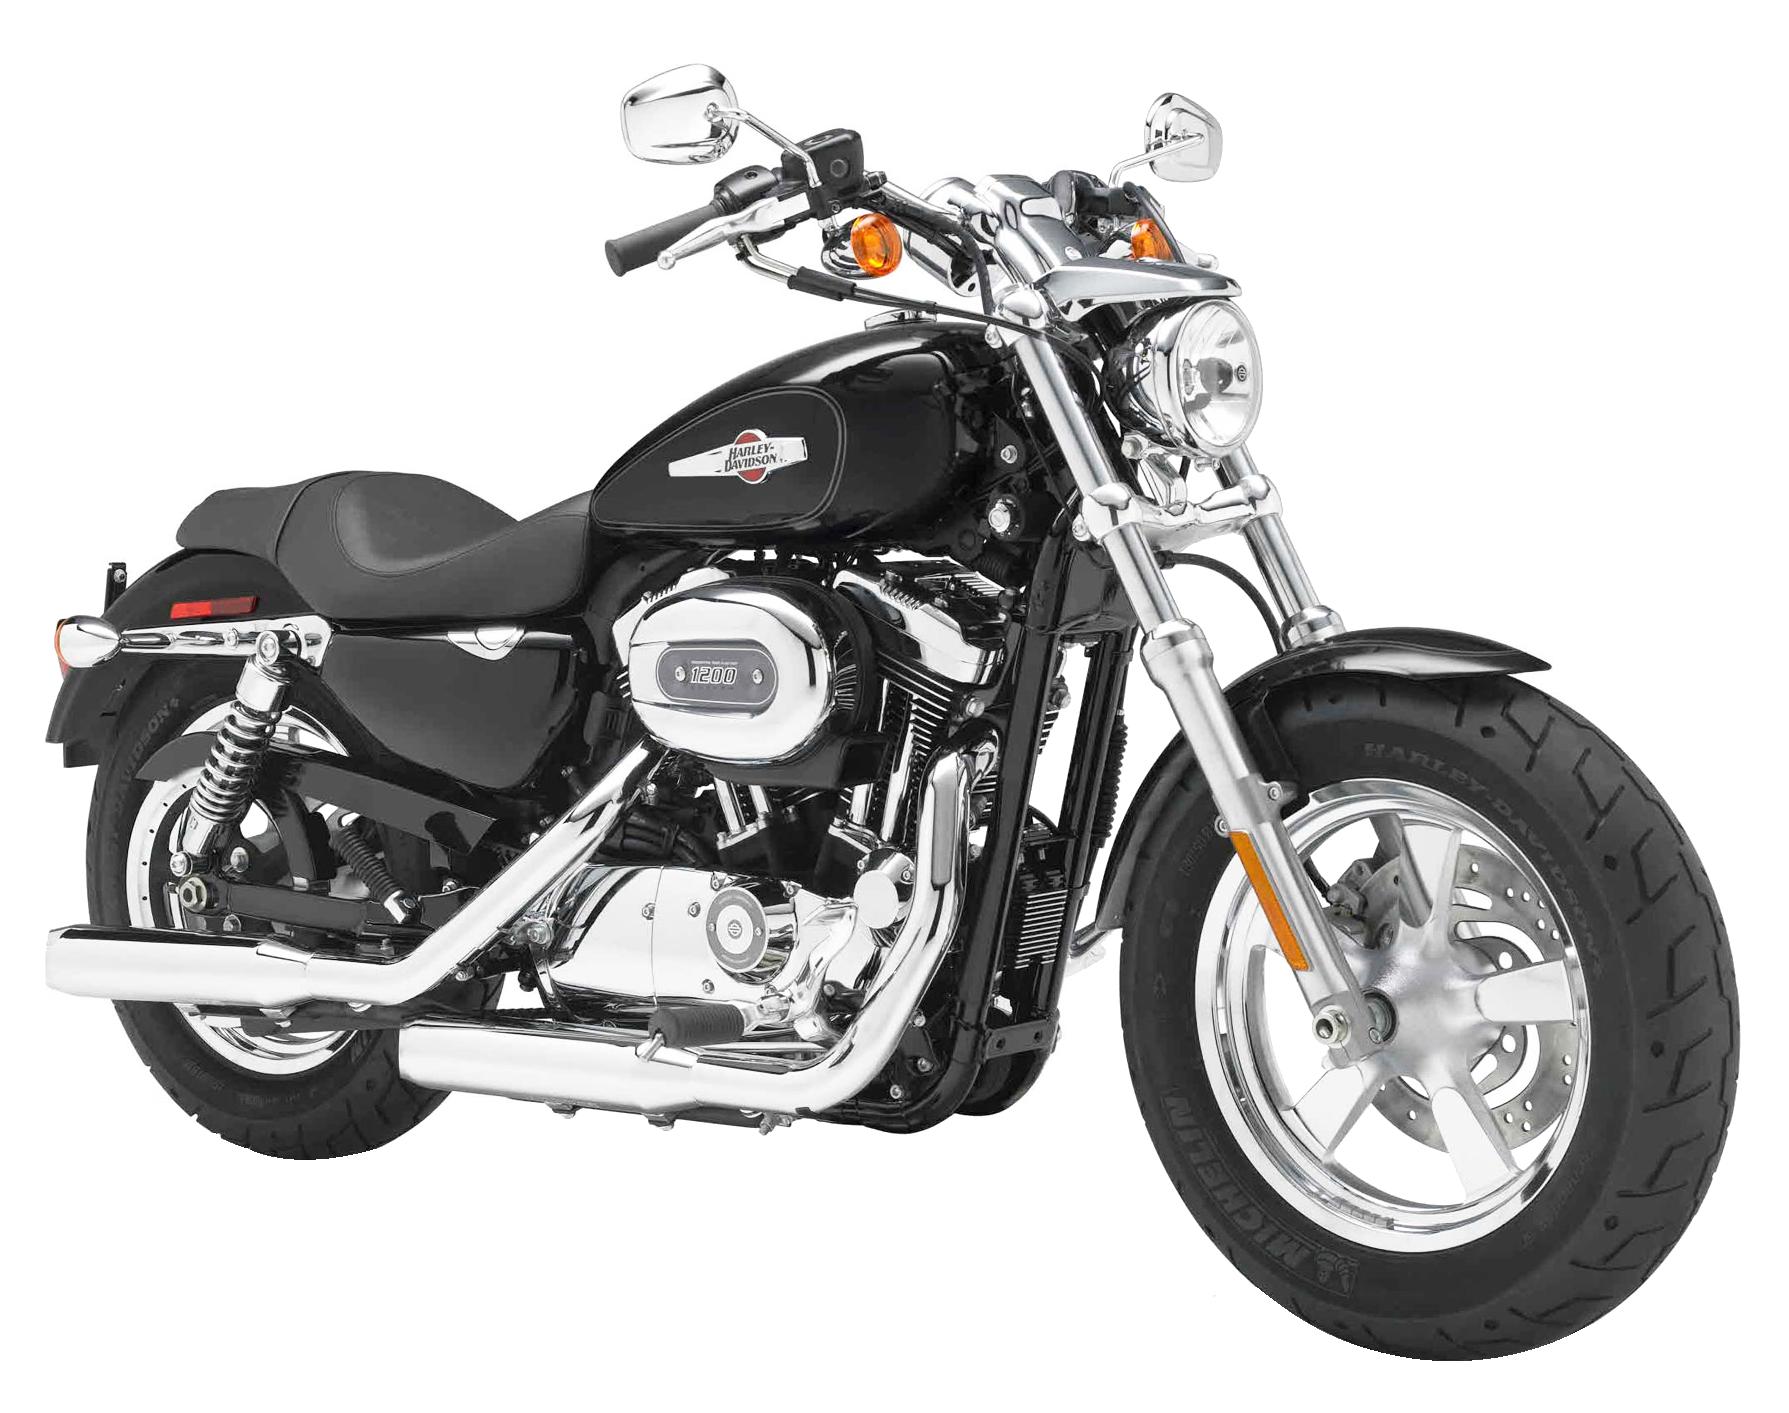 Harley Davidson Sportster 1200 Custom Motorcycle Bike PNG Image.